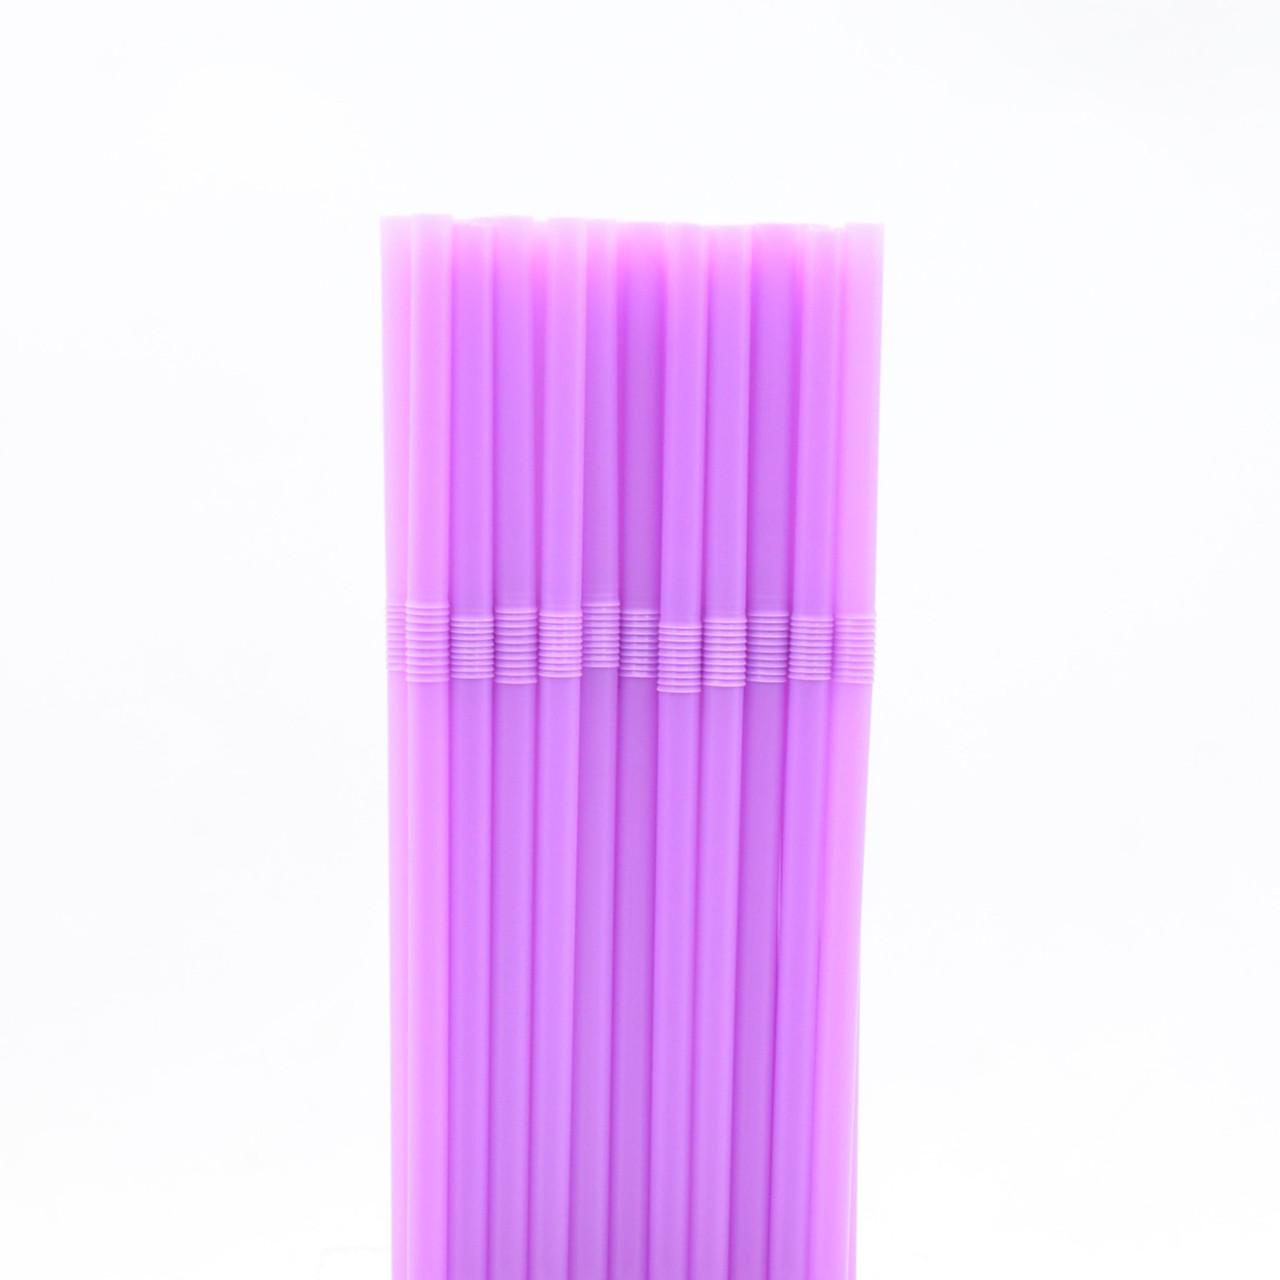 Трубочки для коктейля сиреневые 40шт/уп